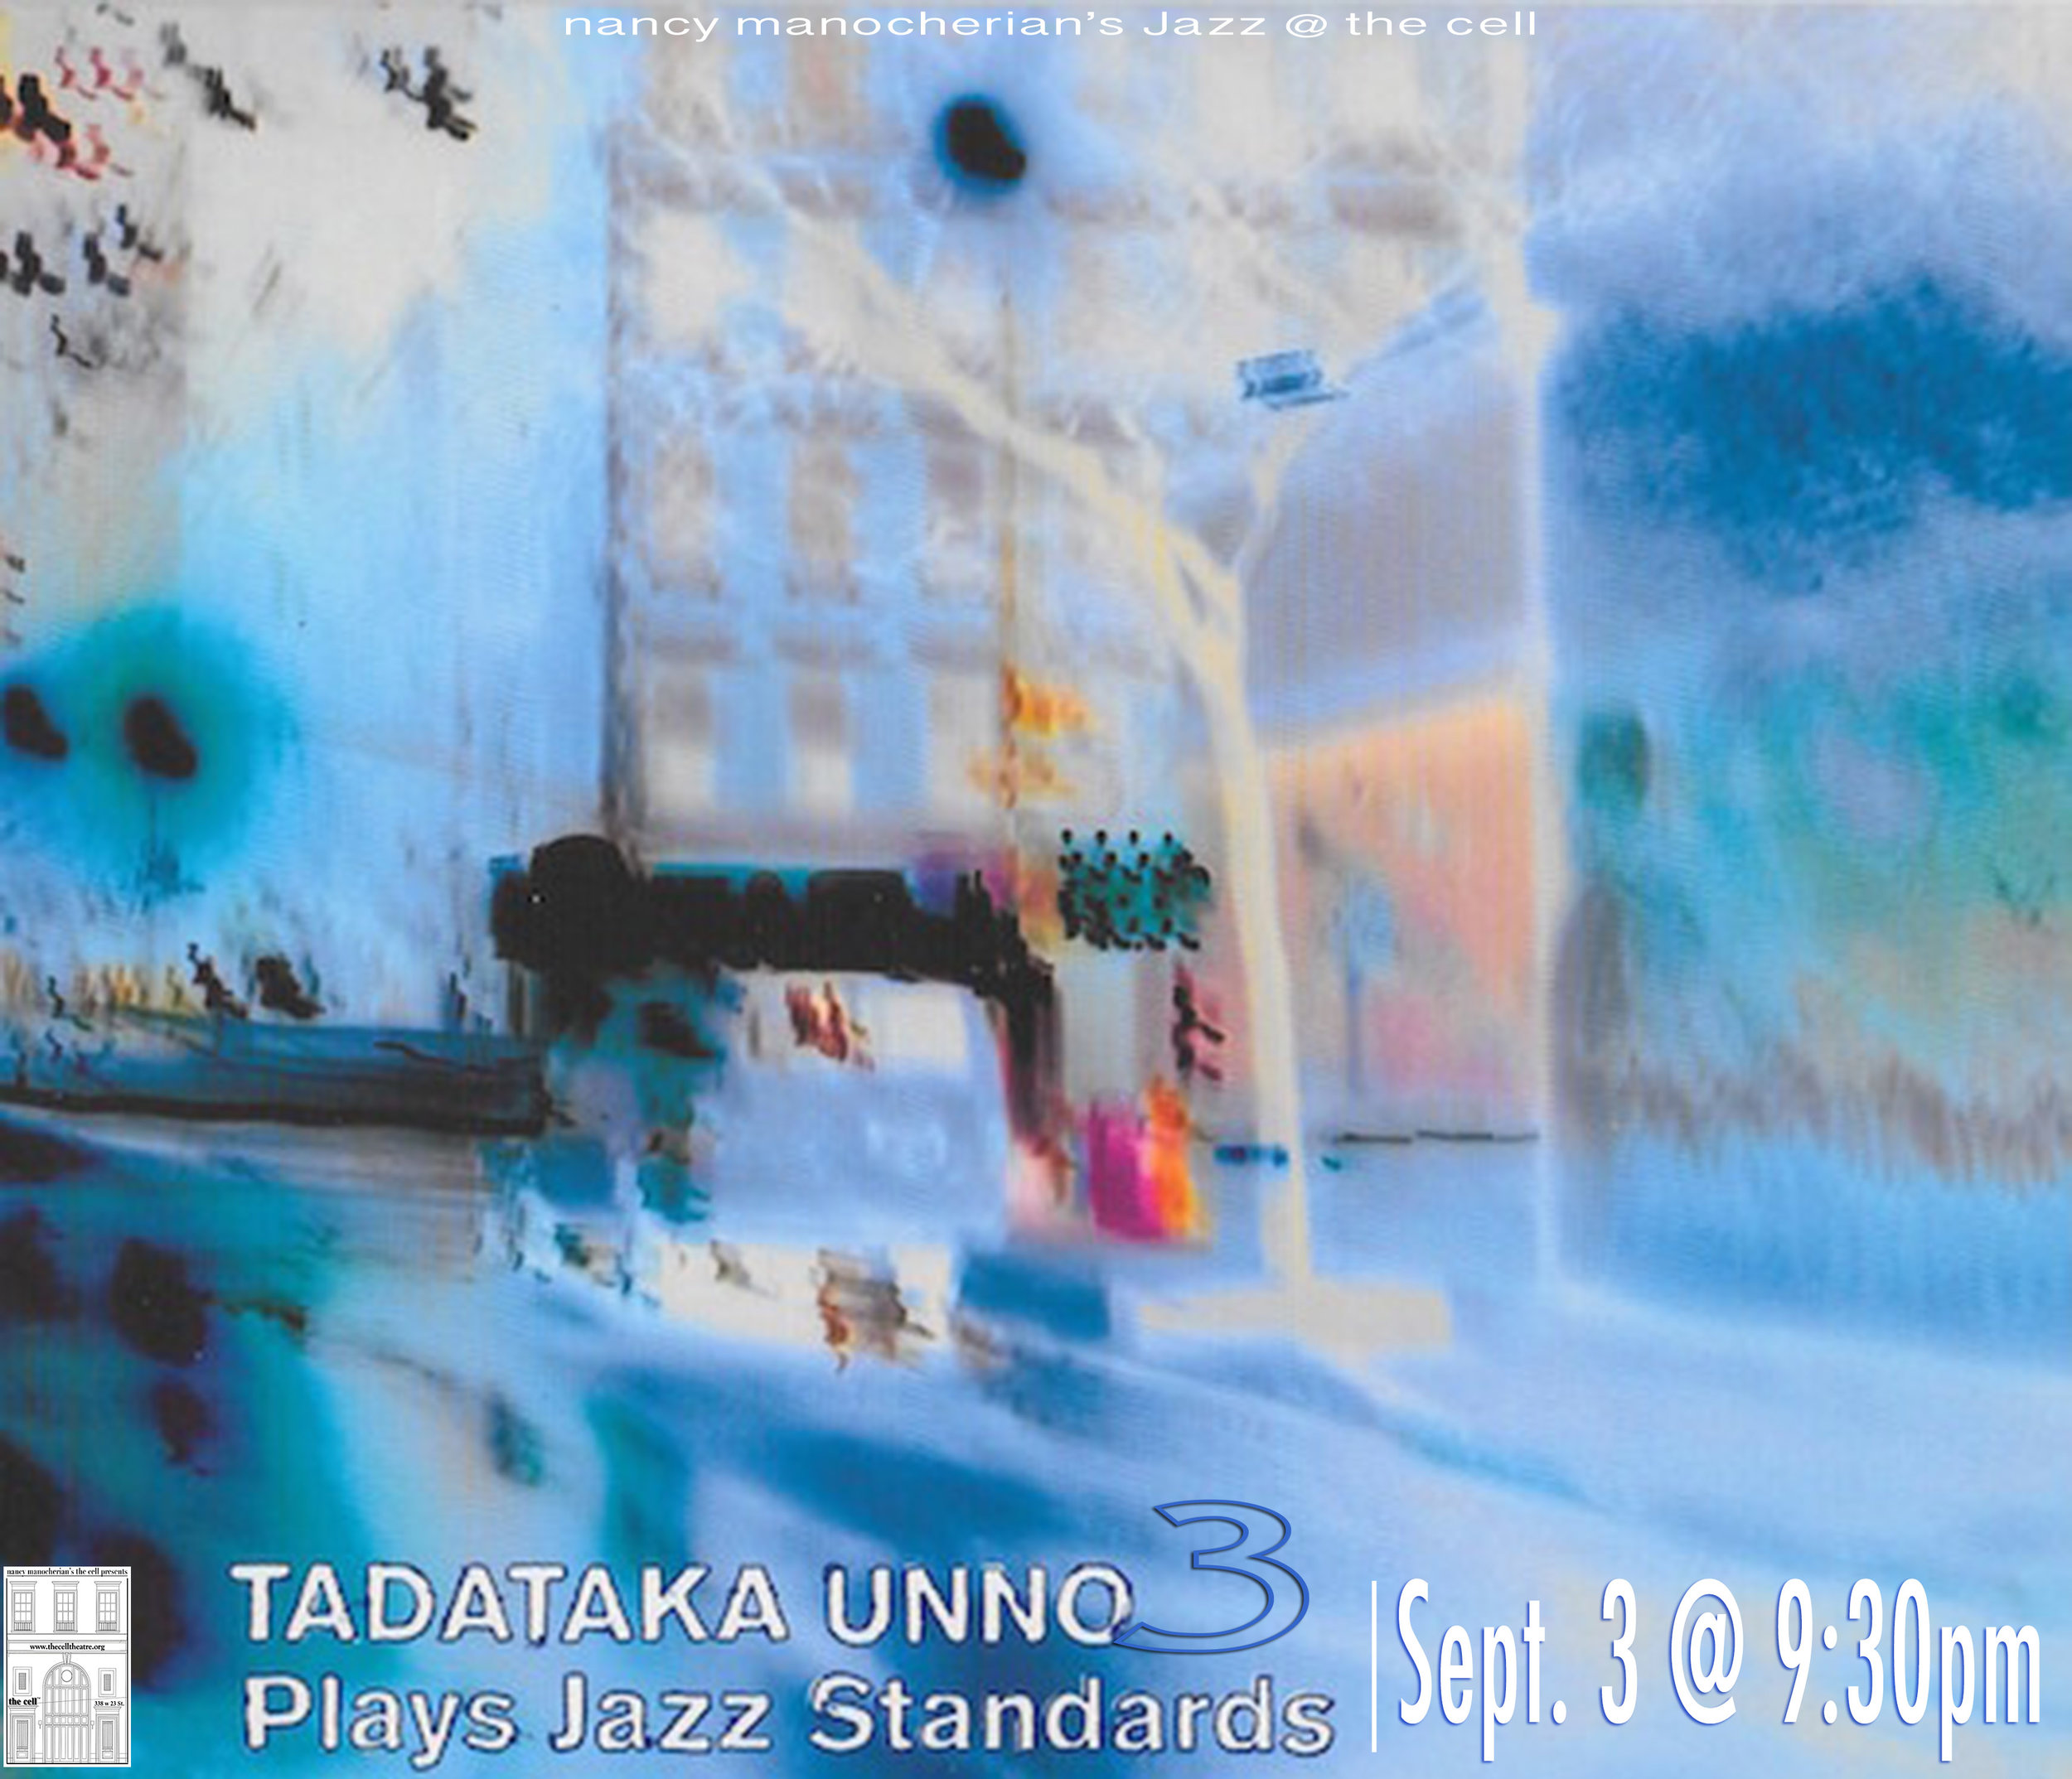 James Carmack,bass  Jonathan Barber on drums   Tadataka Unno, piano